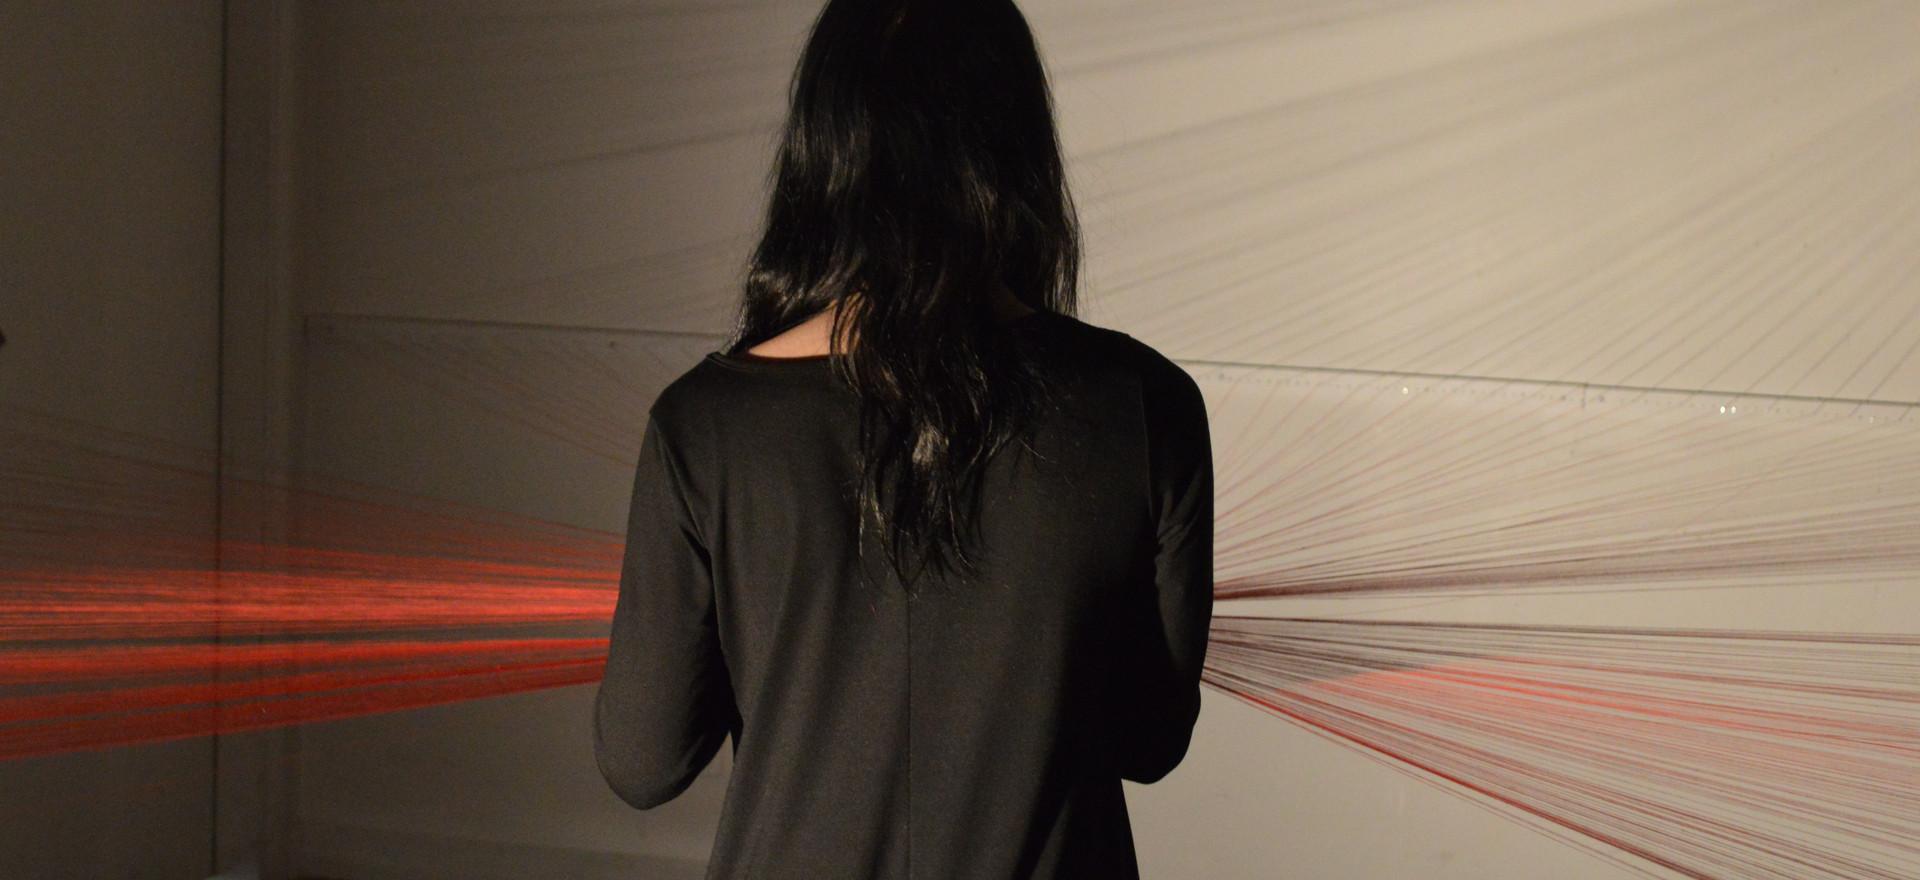 05 Spun 2 (Femme Wave).JPG